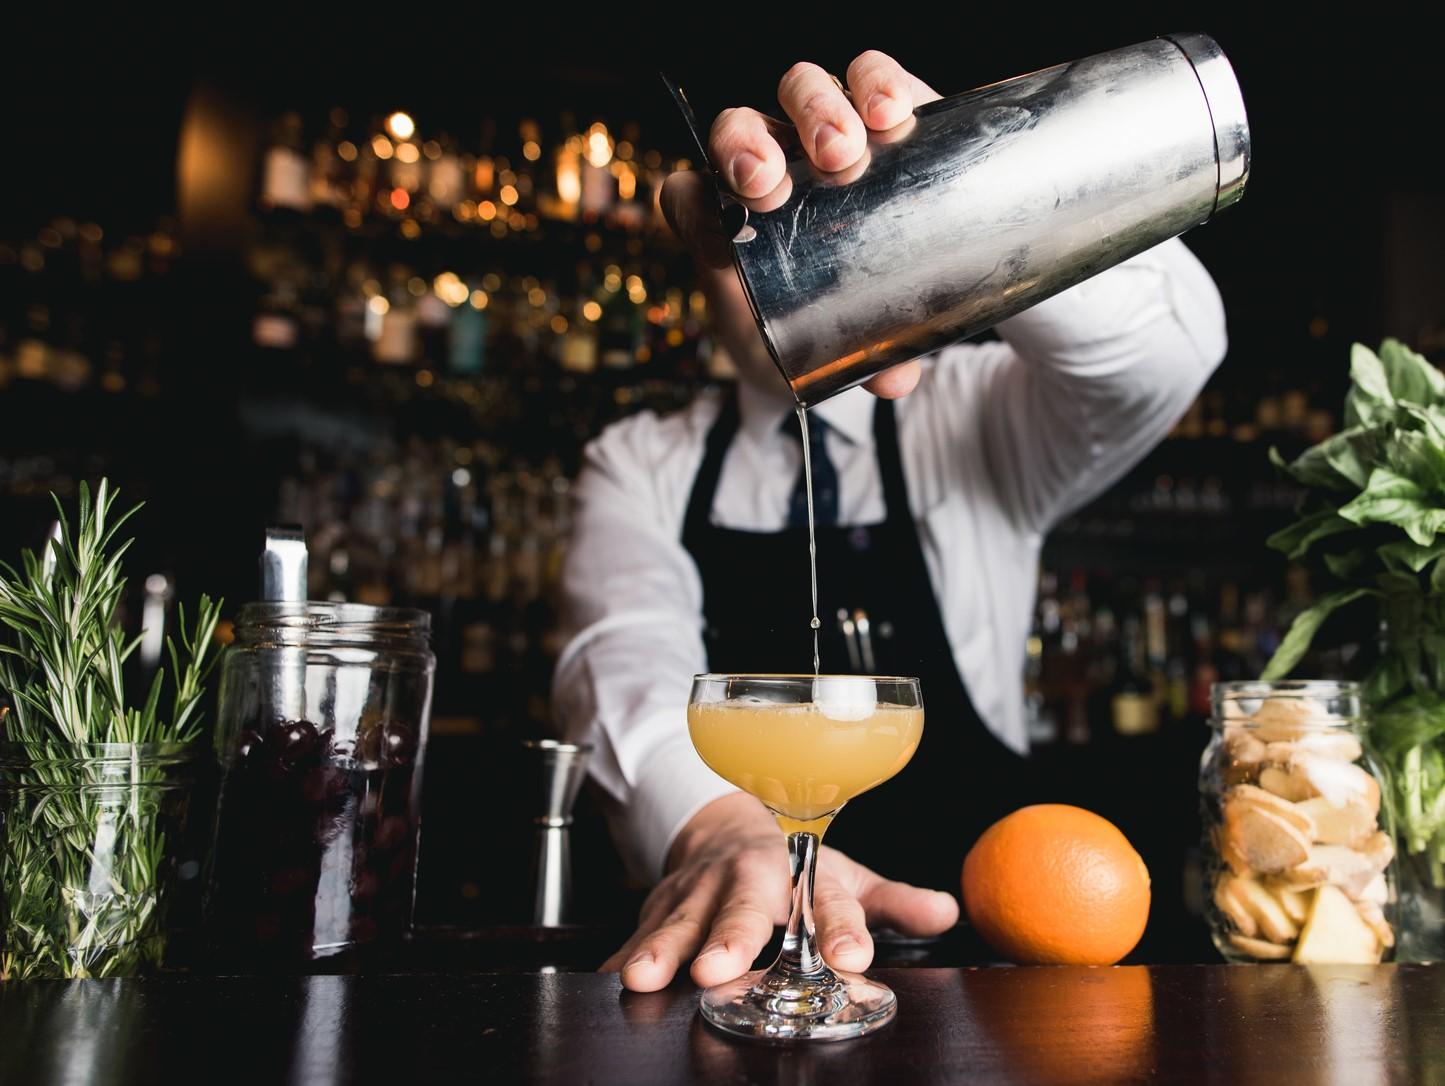 Jozibars mobile bar services – Three Summer Season Gin Cocktails